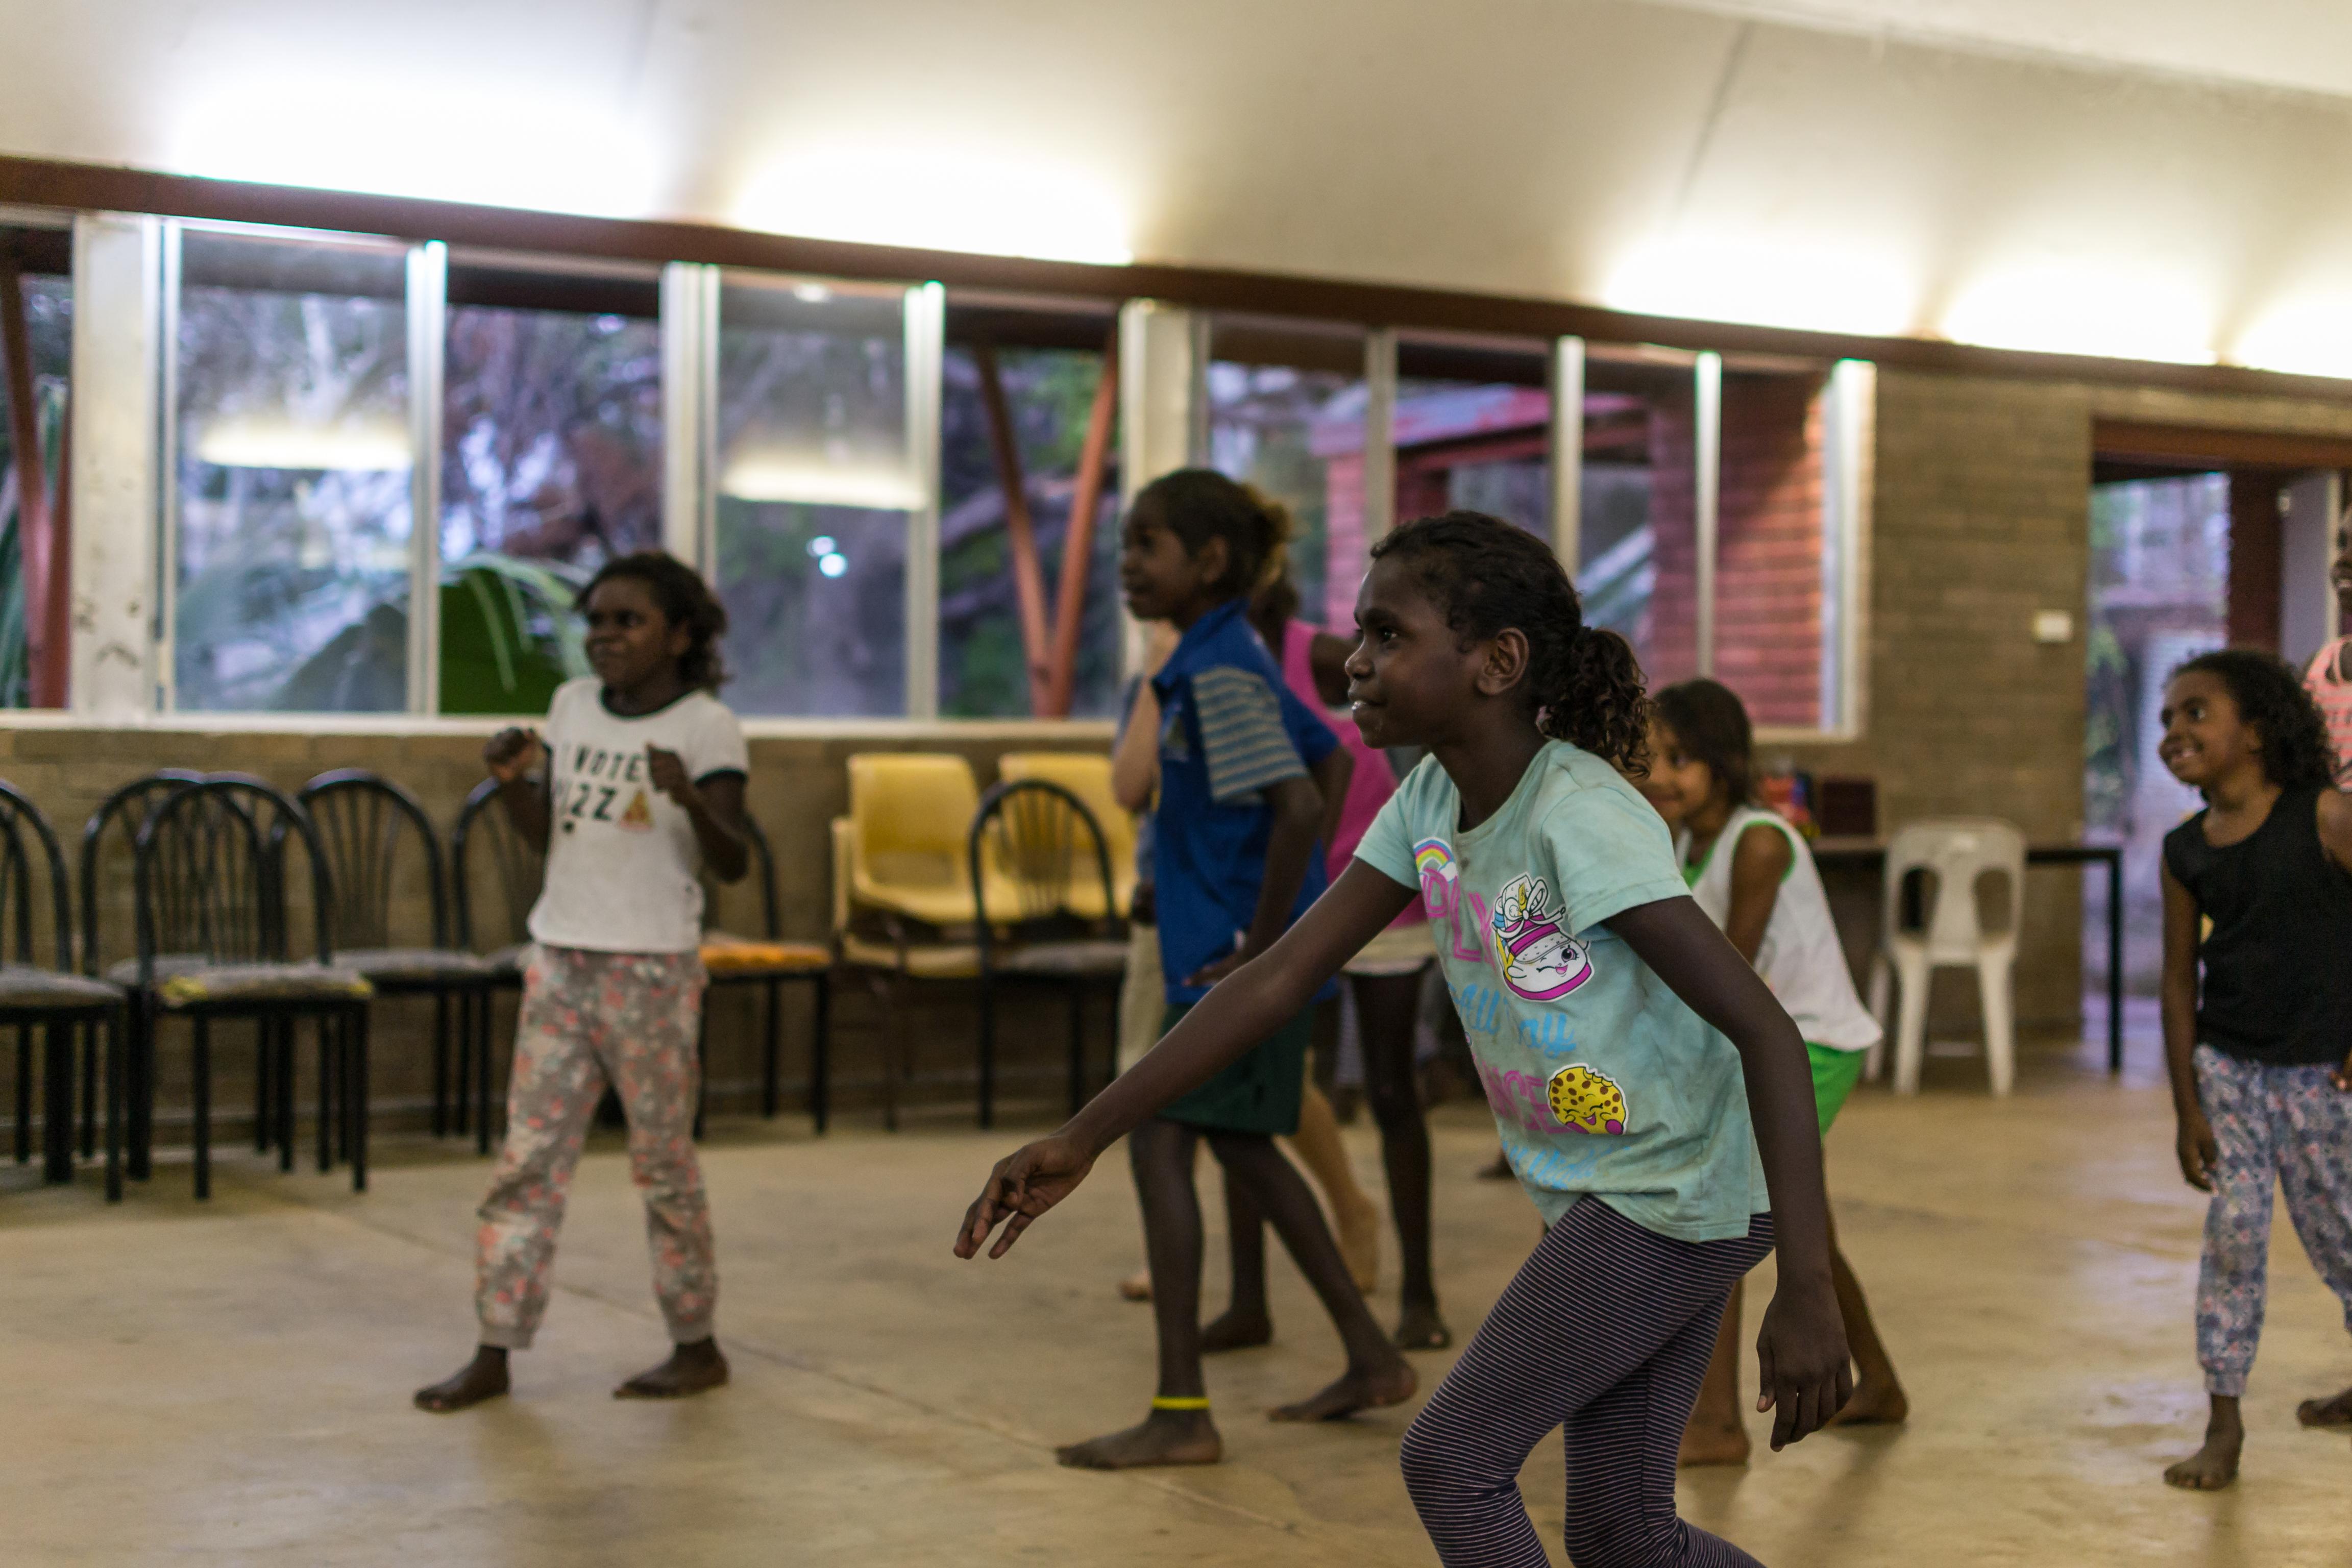 Kids play 'Red Light, Green Light' at Kids Club, Barunga